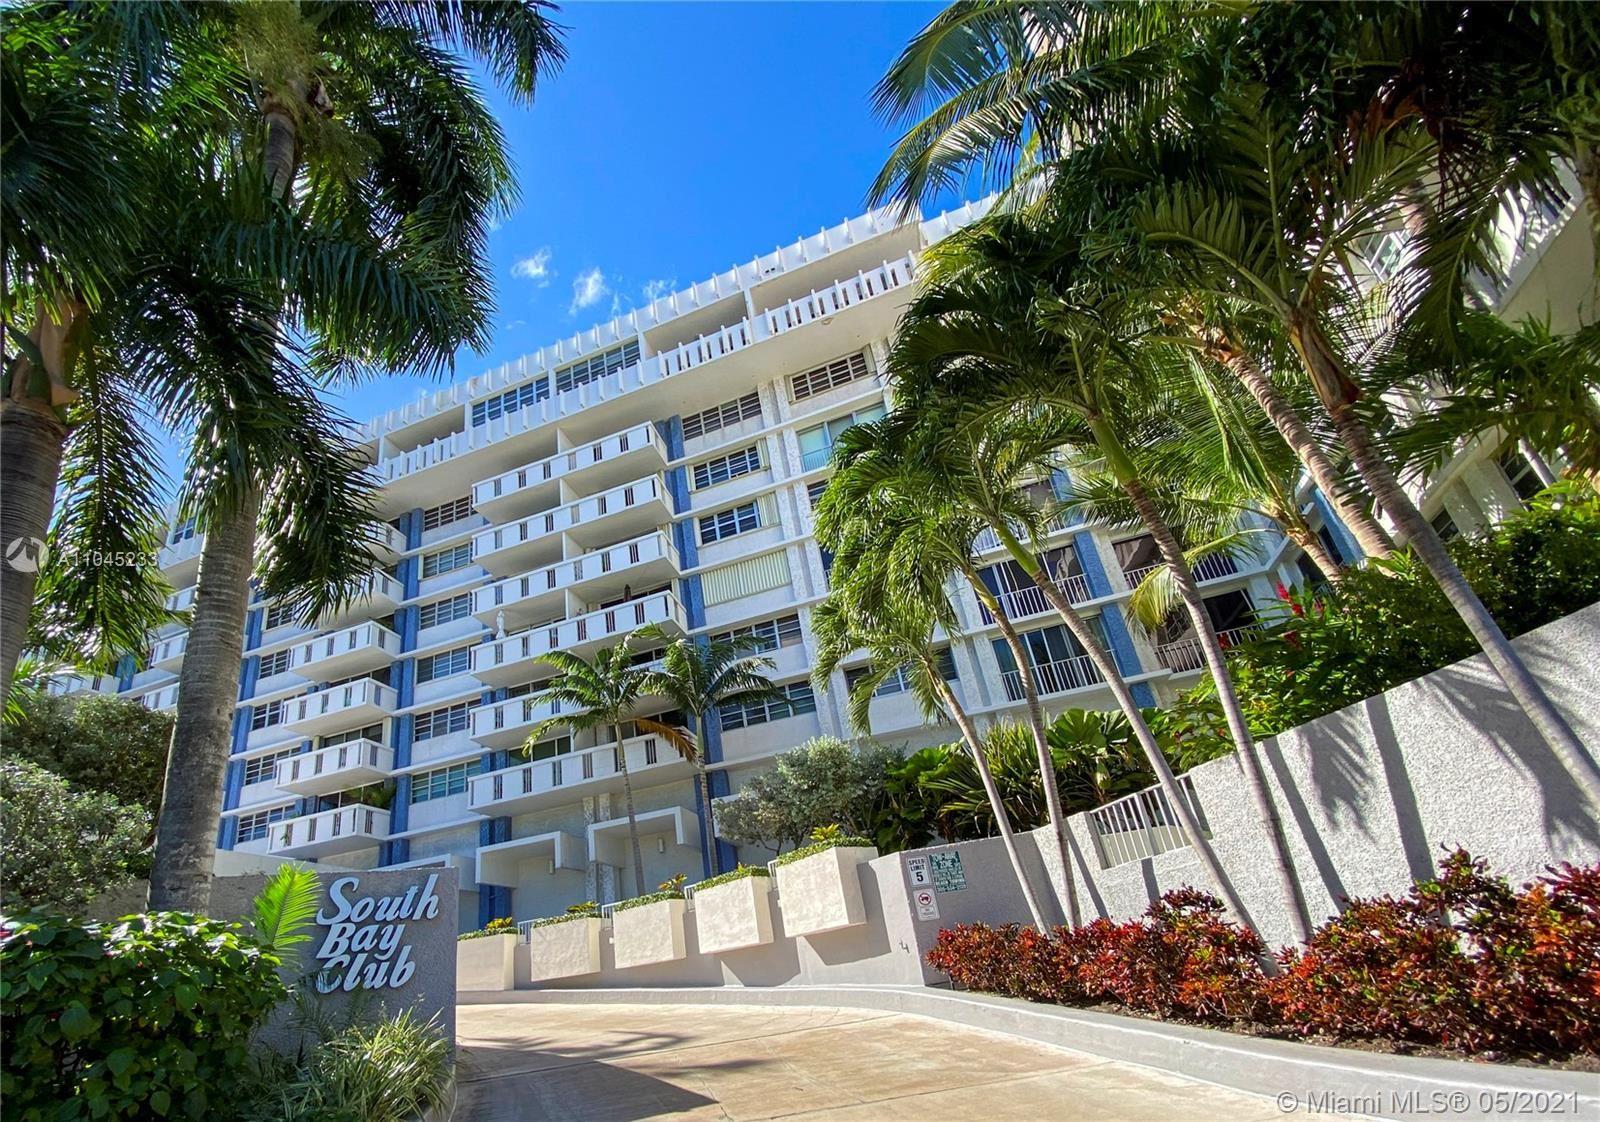 800 West Ave #738, Miami Beach, FL 33139 - #: A11045233